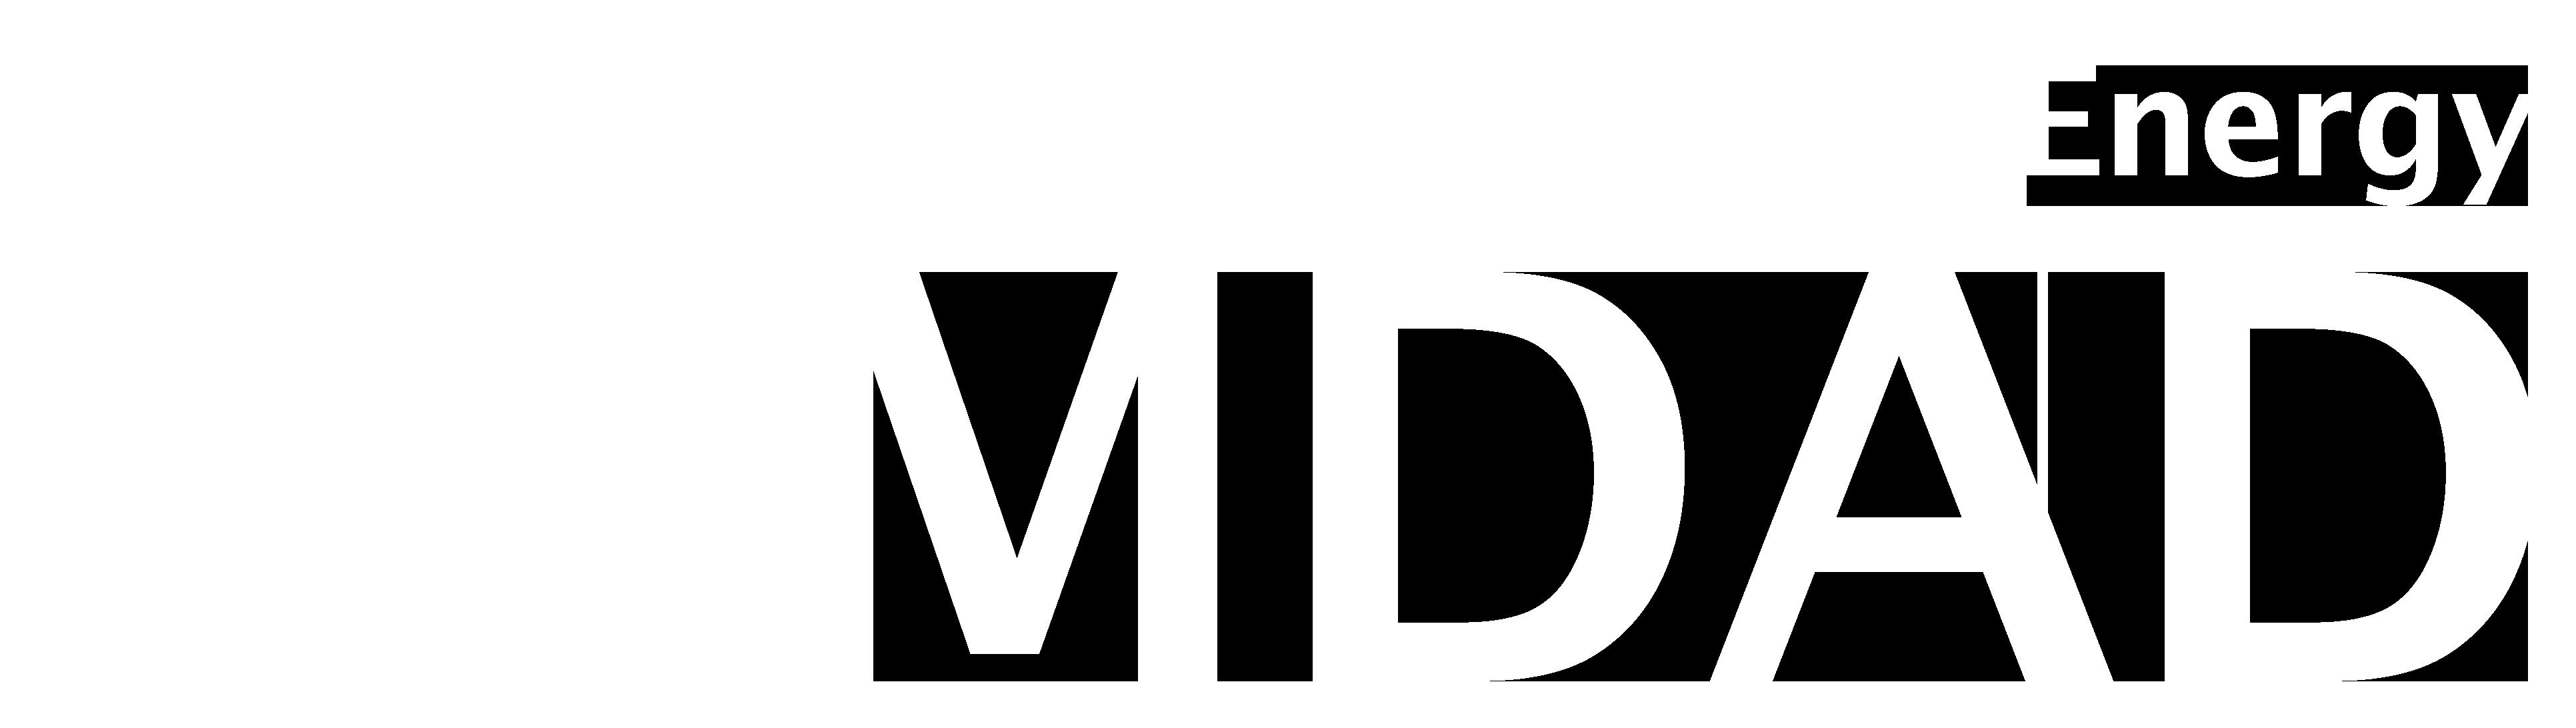 Emdad Energy logo